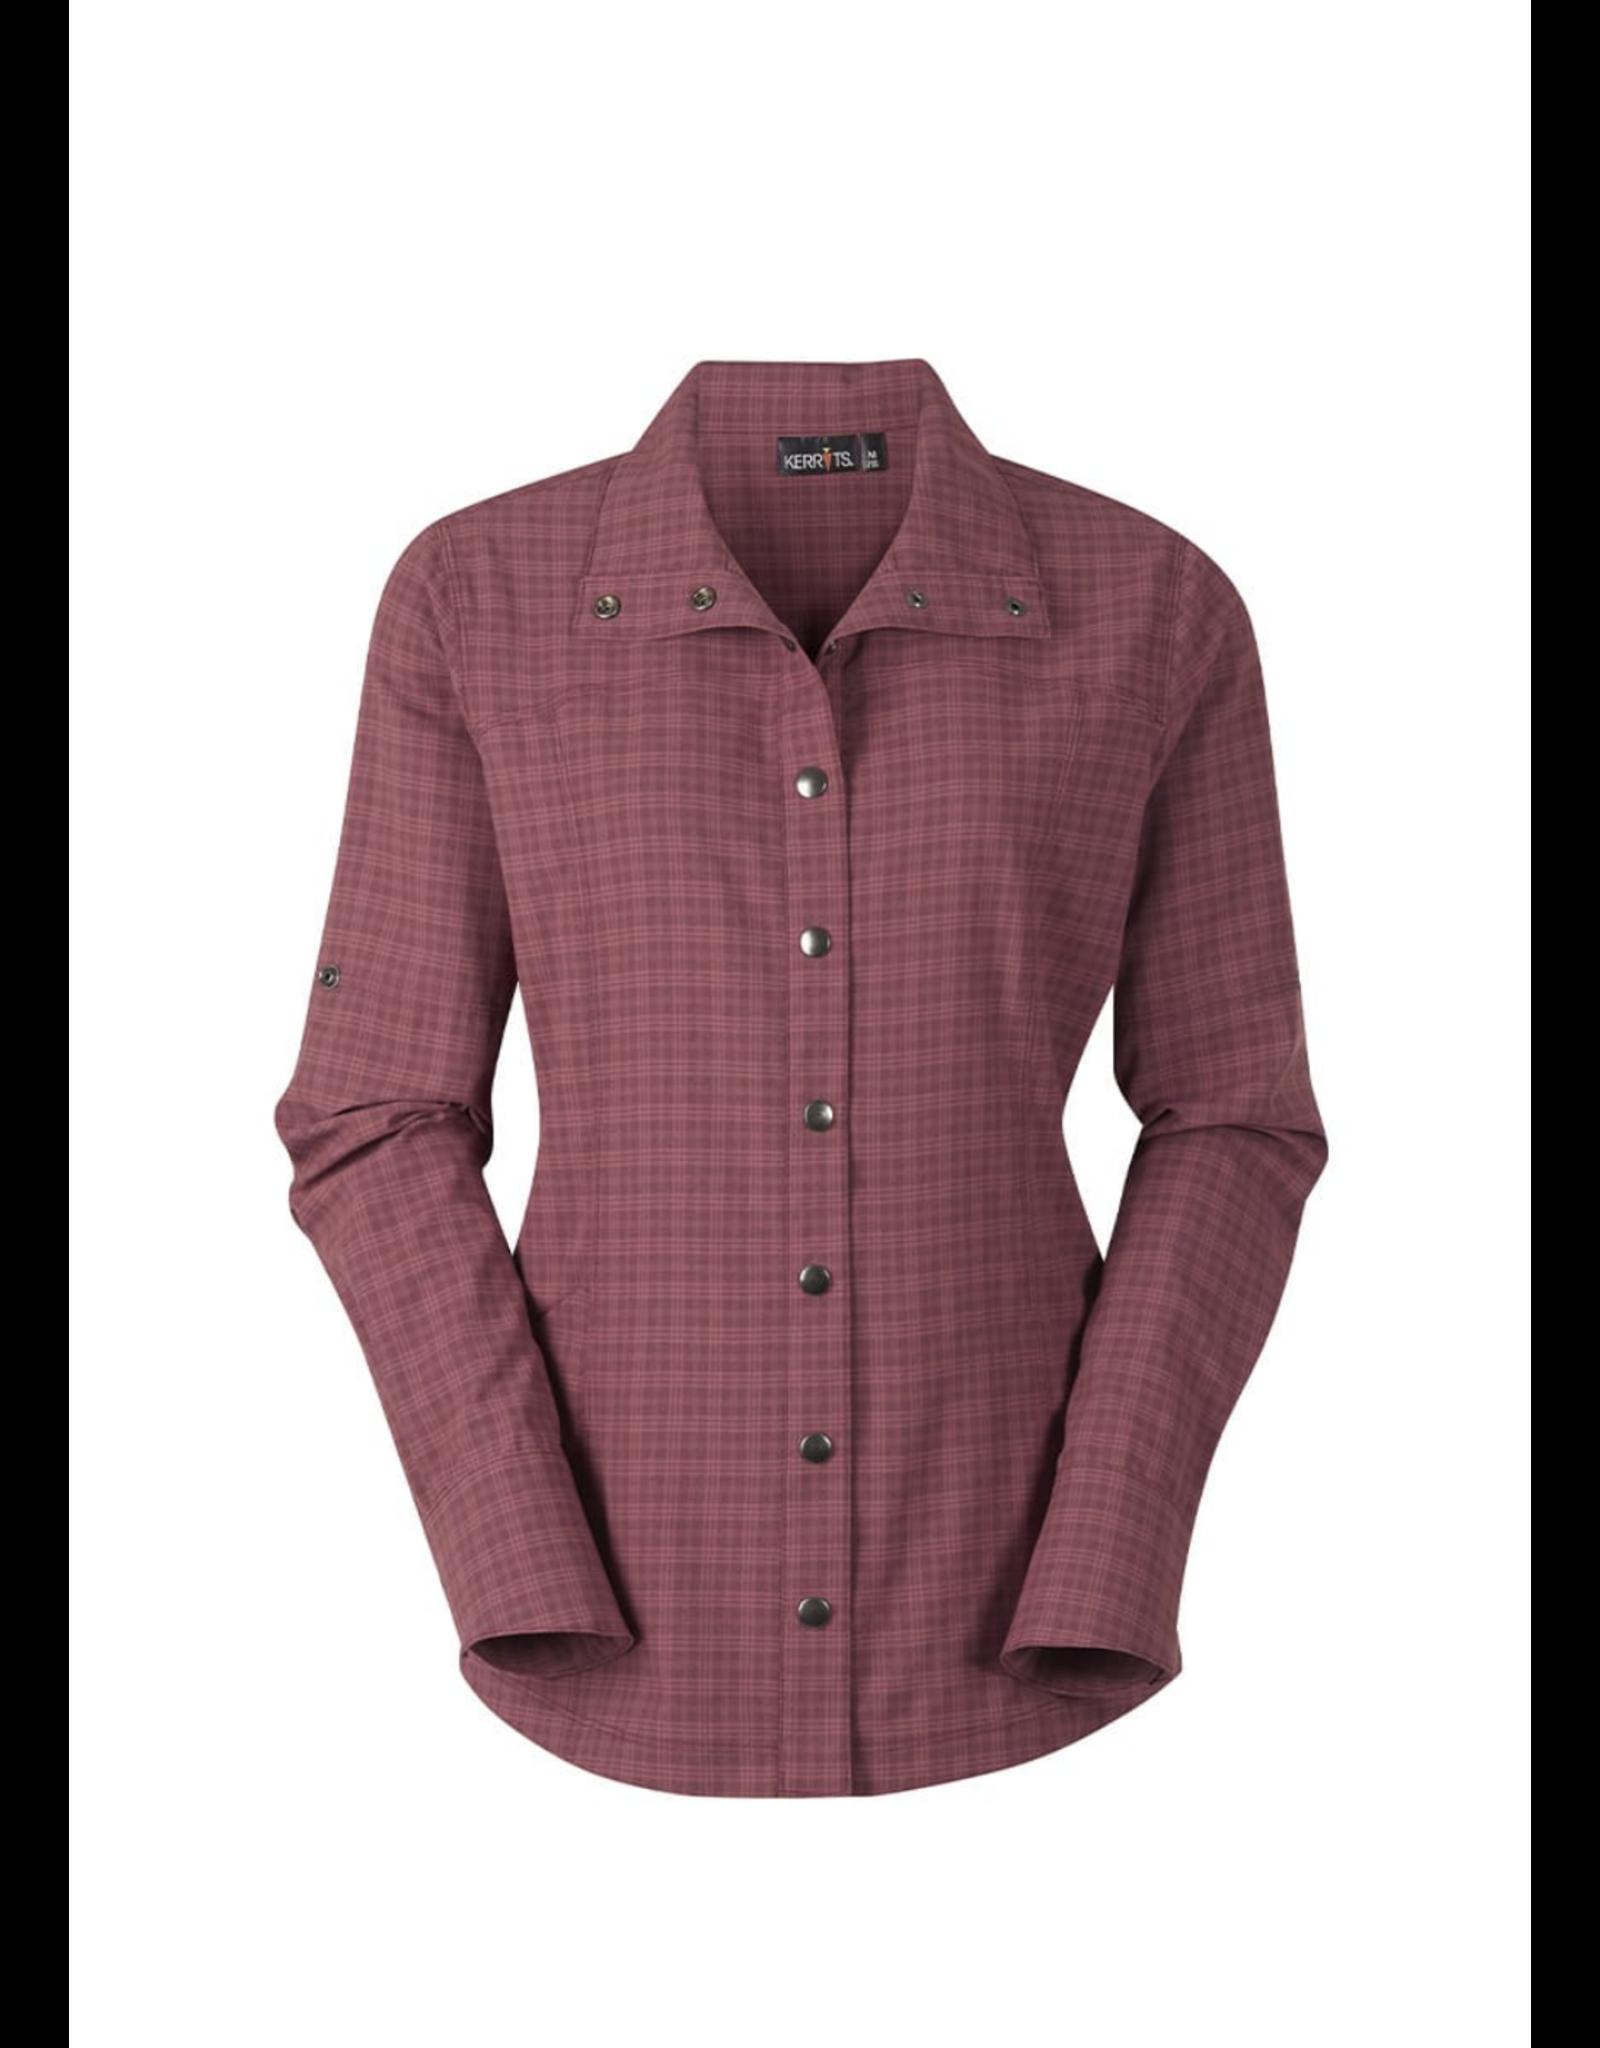 Shady Breeze Convertible Sun Shirt